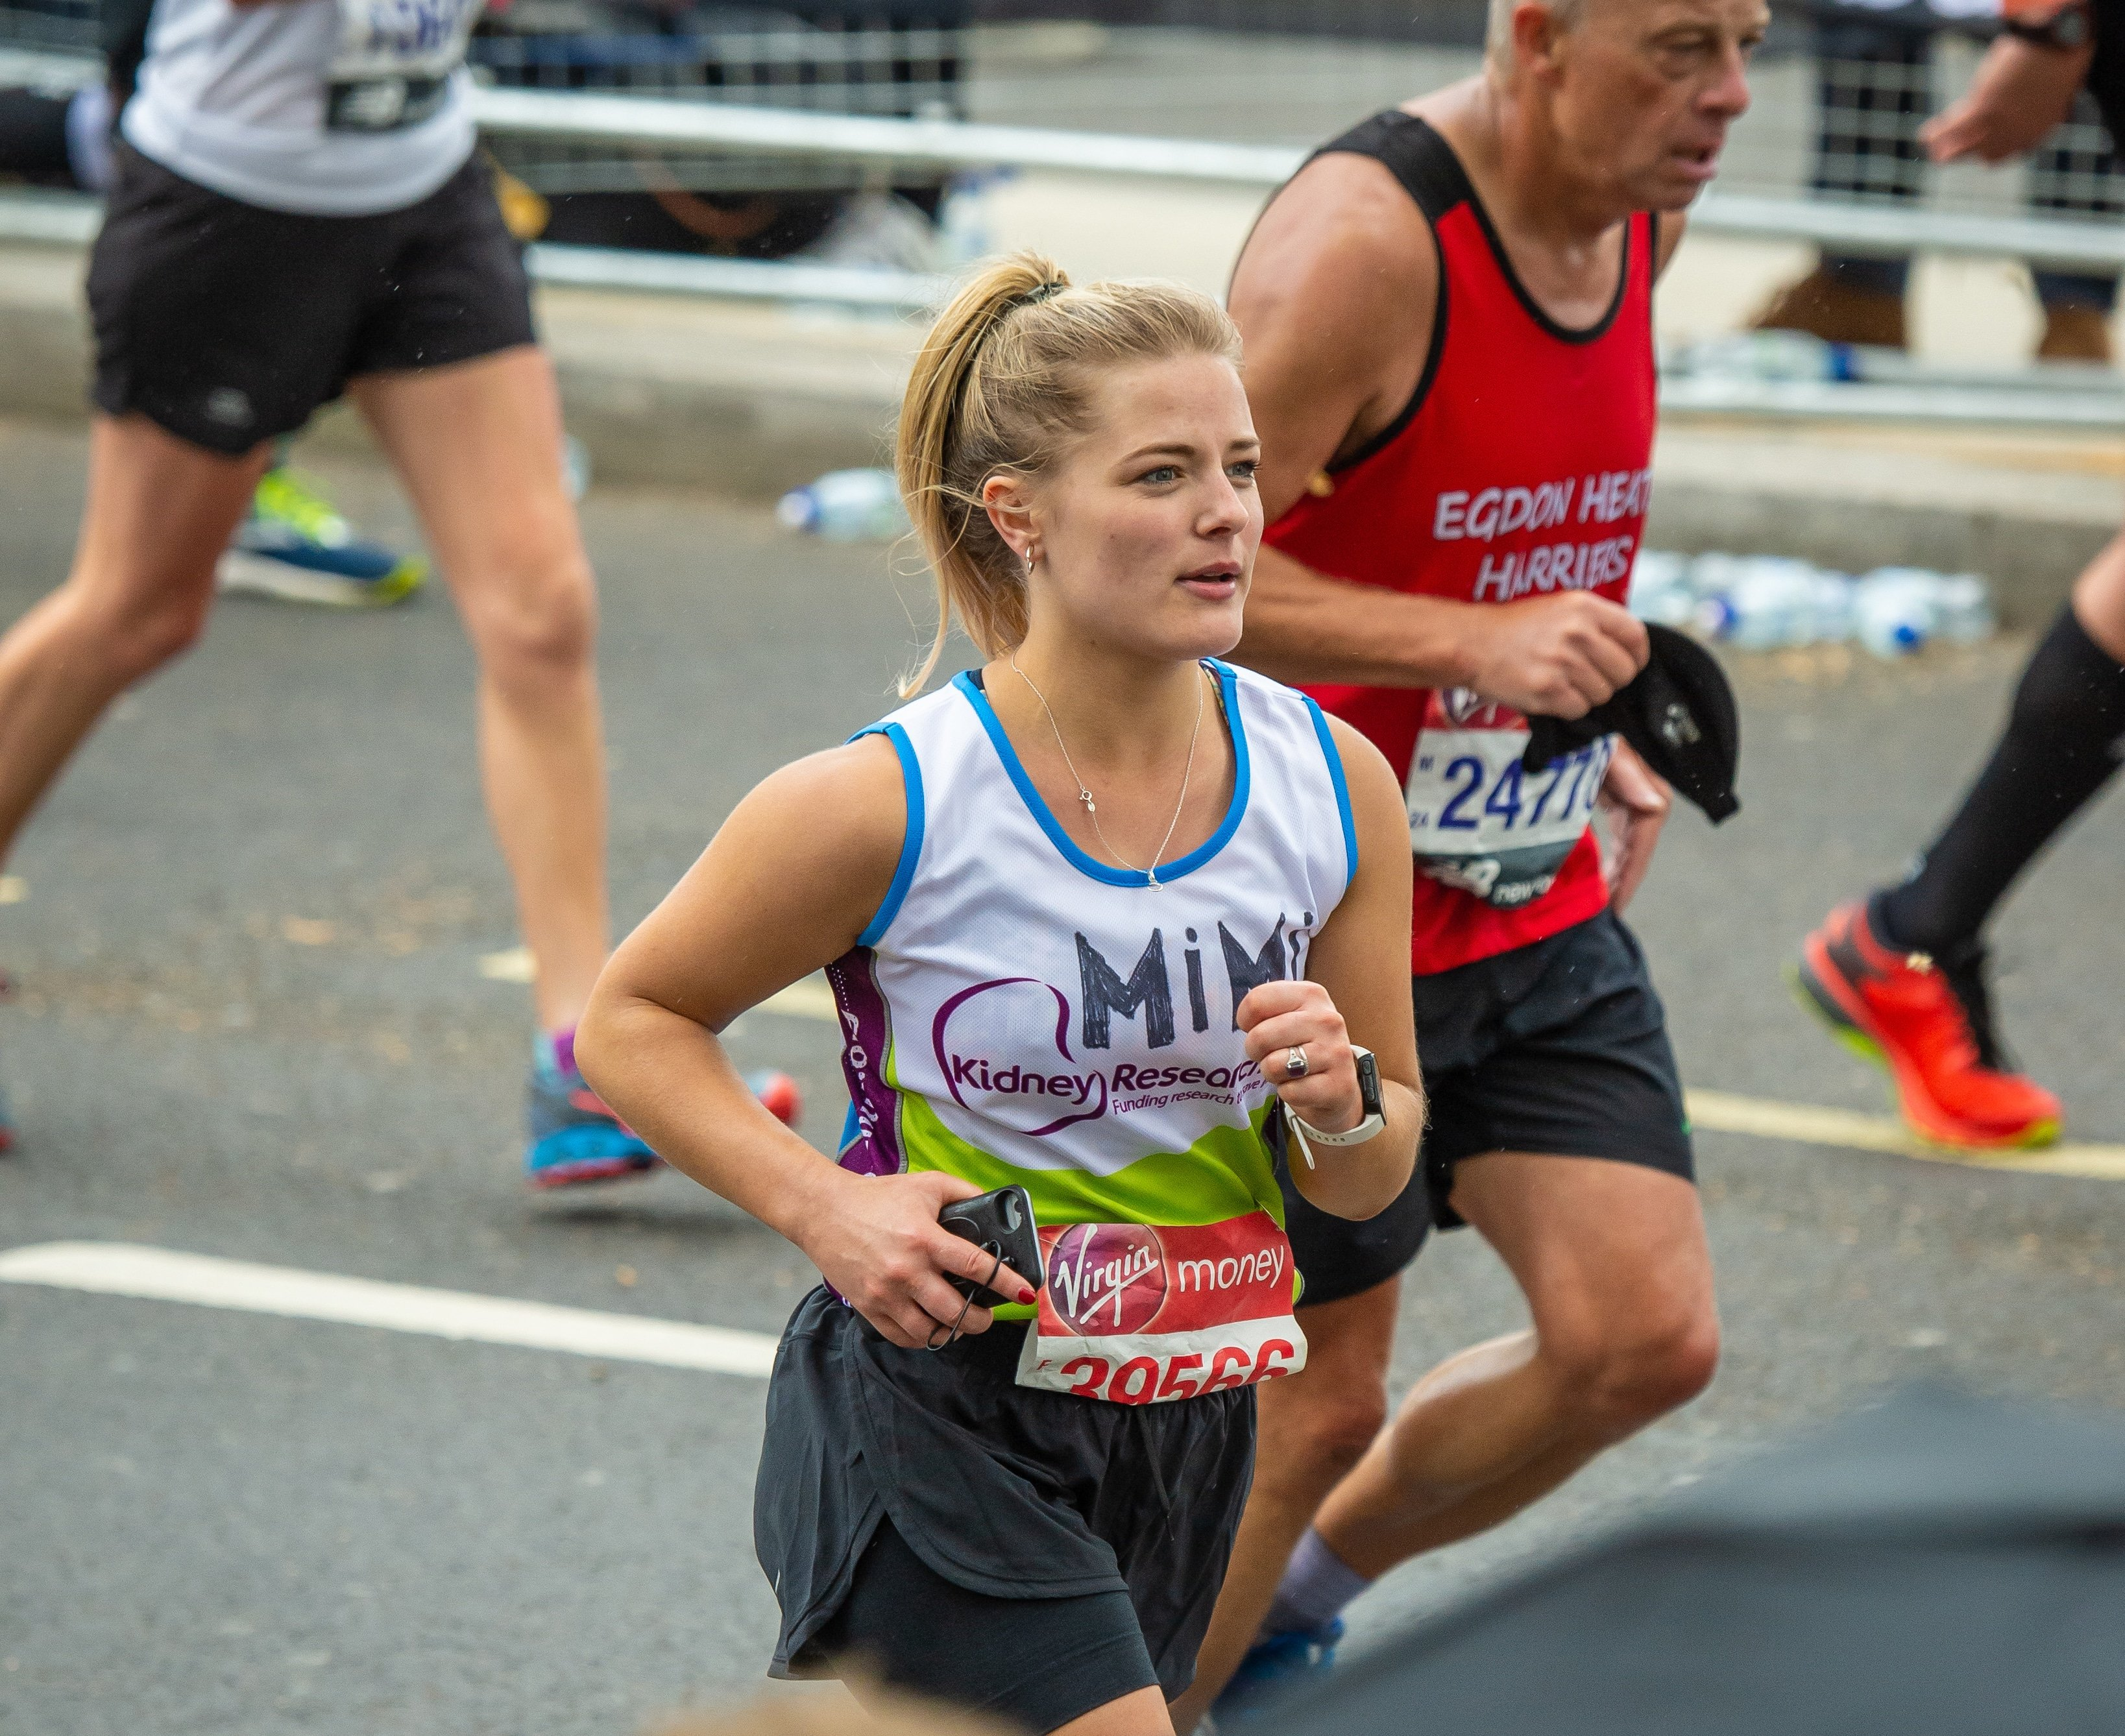 The Enervit Peterborough Marathon Kidney Research Uk